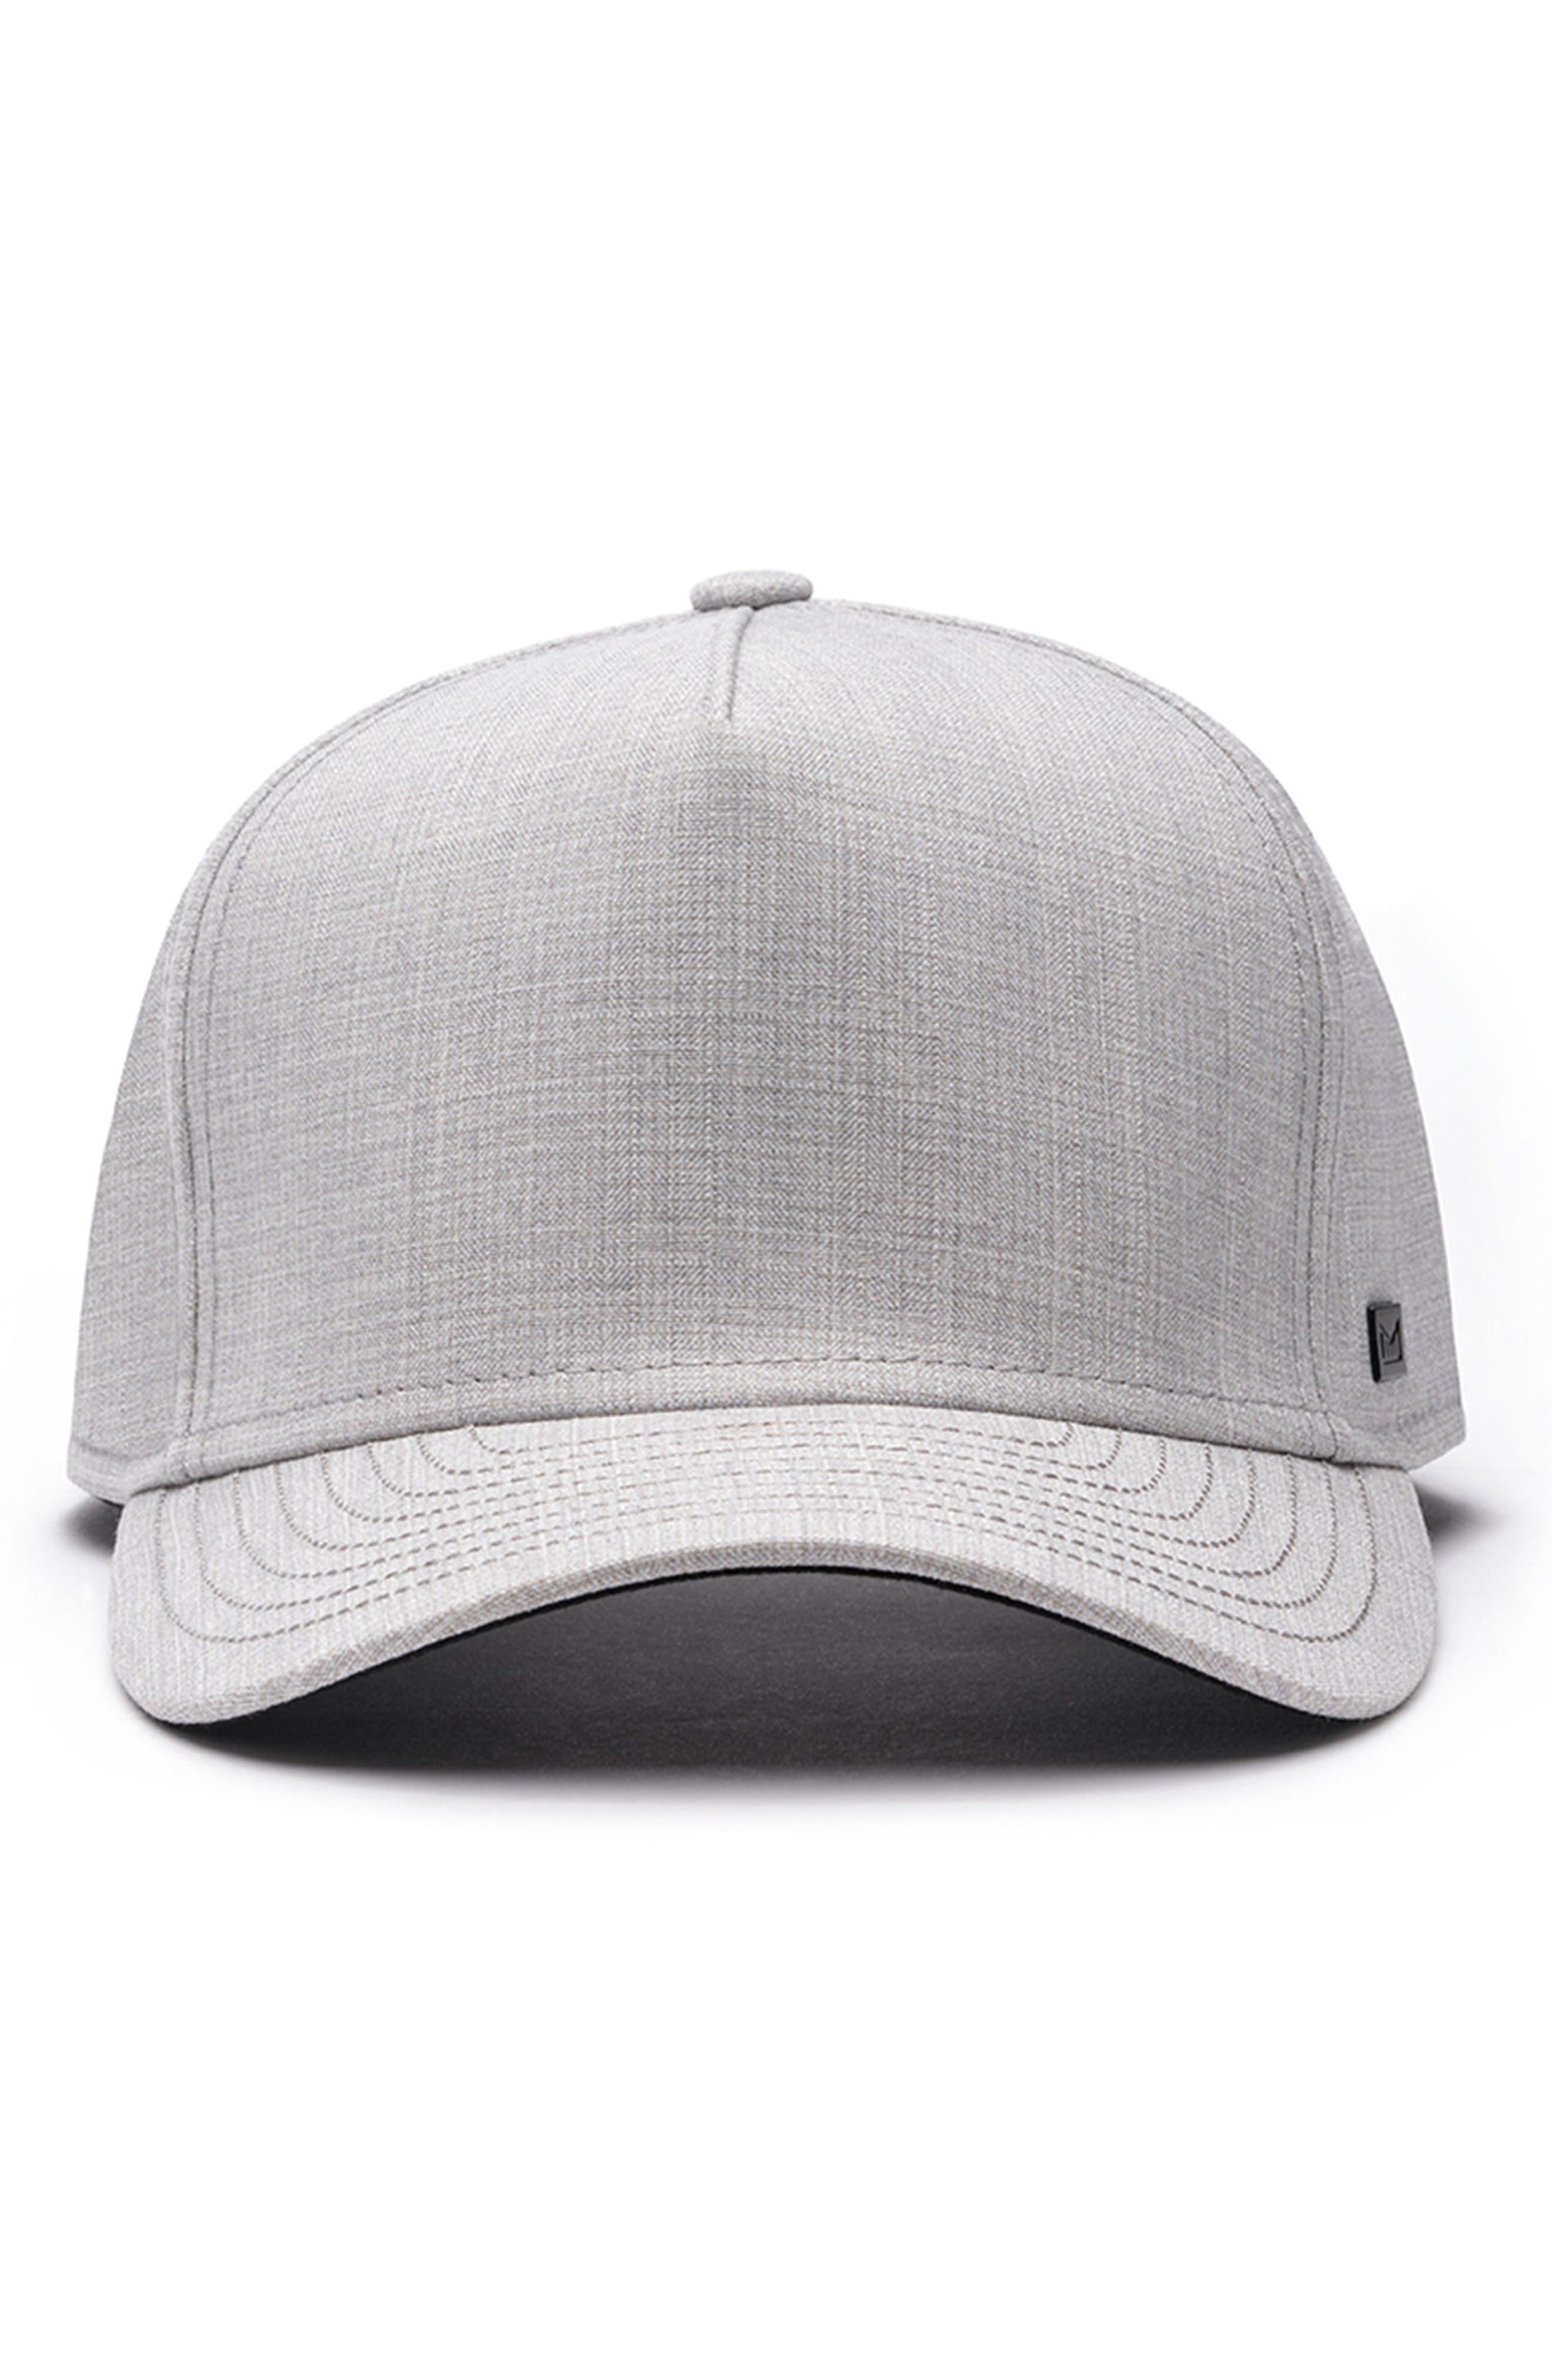 Odyssey Baseball Cap,                             Alternate thumbnail 2, color,                             Light Grey